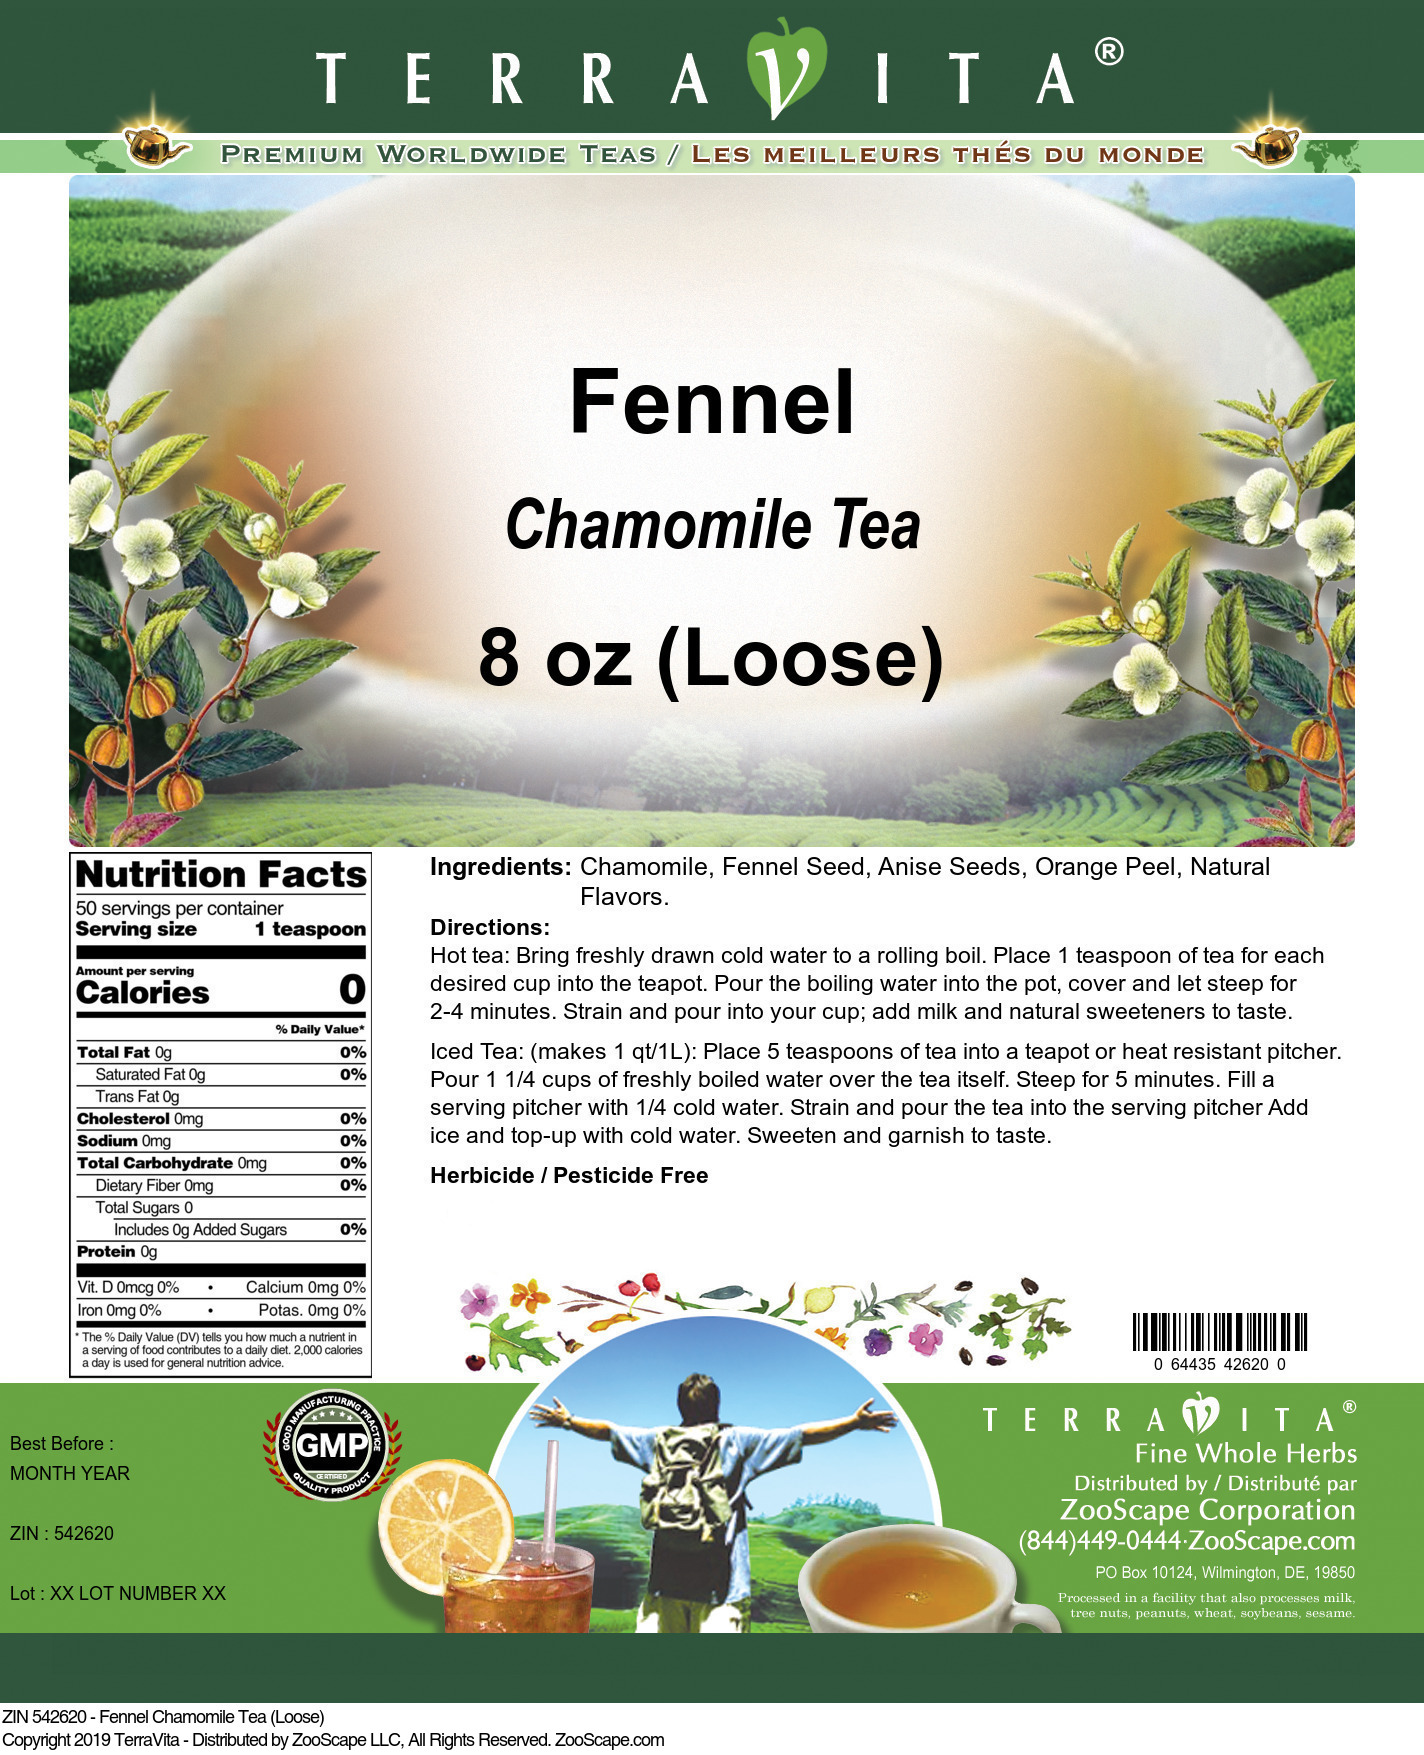 Fennel Chamomile Tea